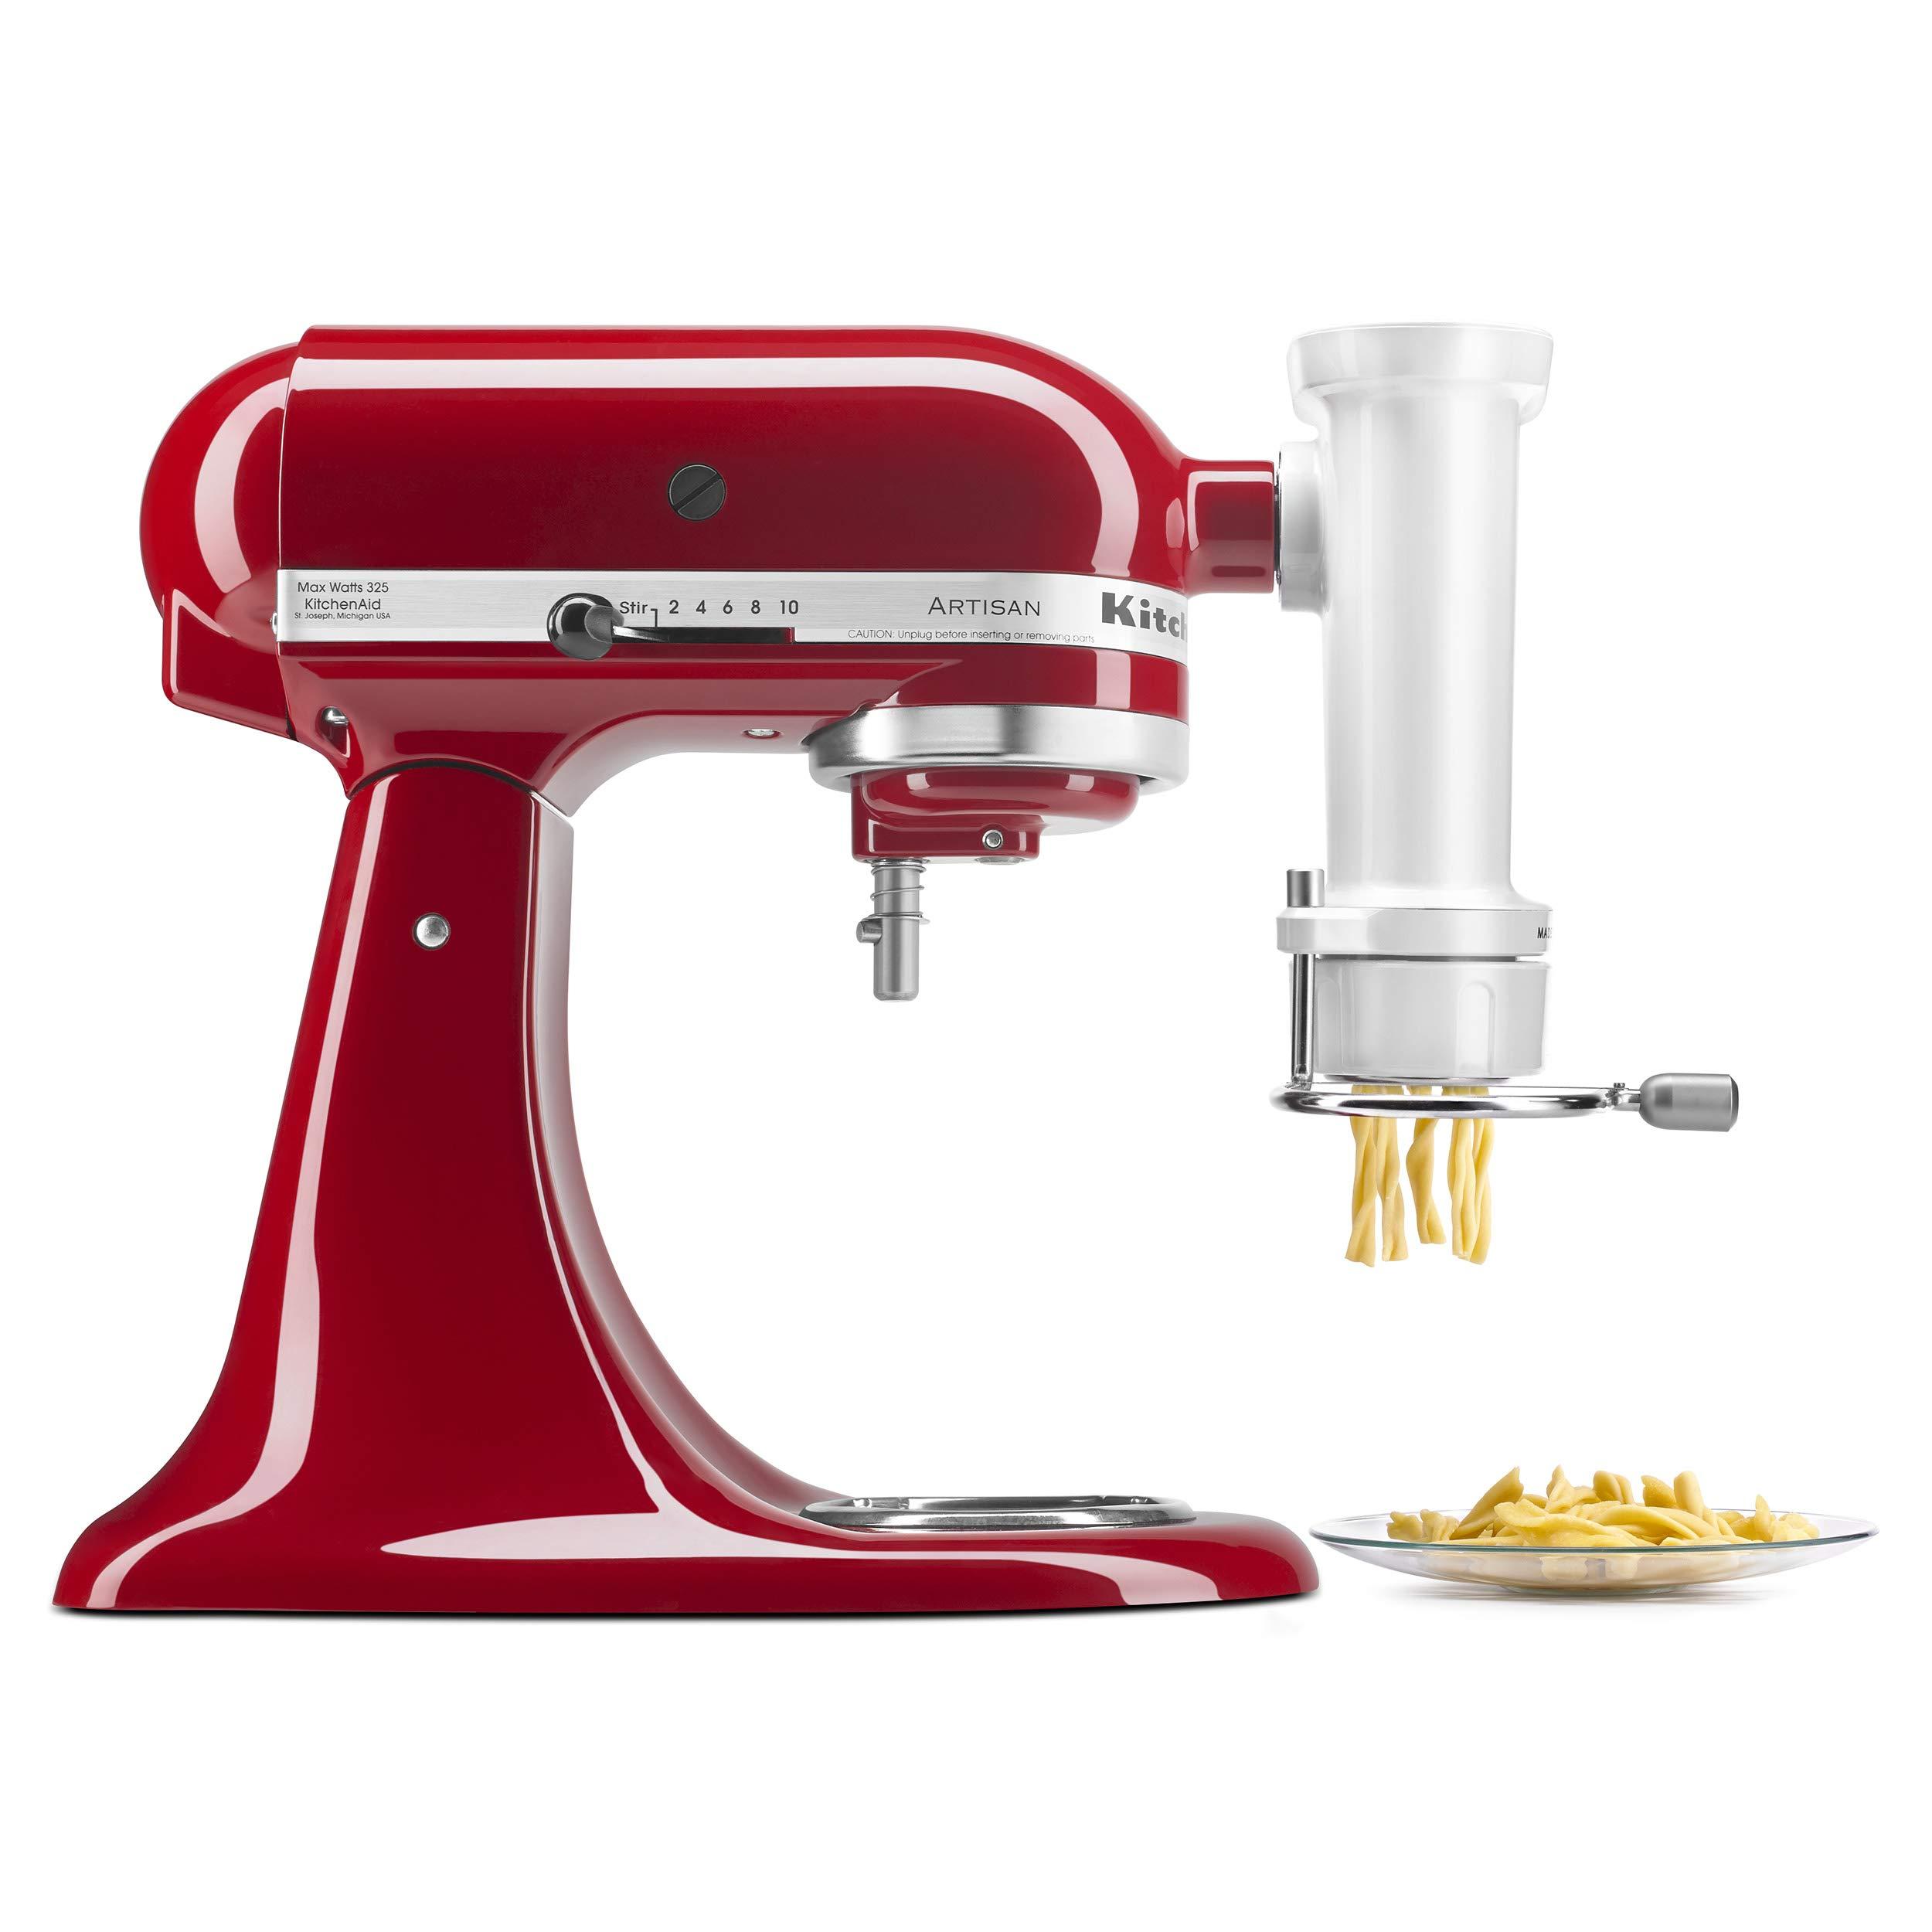 KitchenAid KSMPEXTA Gourmet Pasta Press Attachment with 6 Interchangeable Pasta Plates, White by KitchenAid